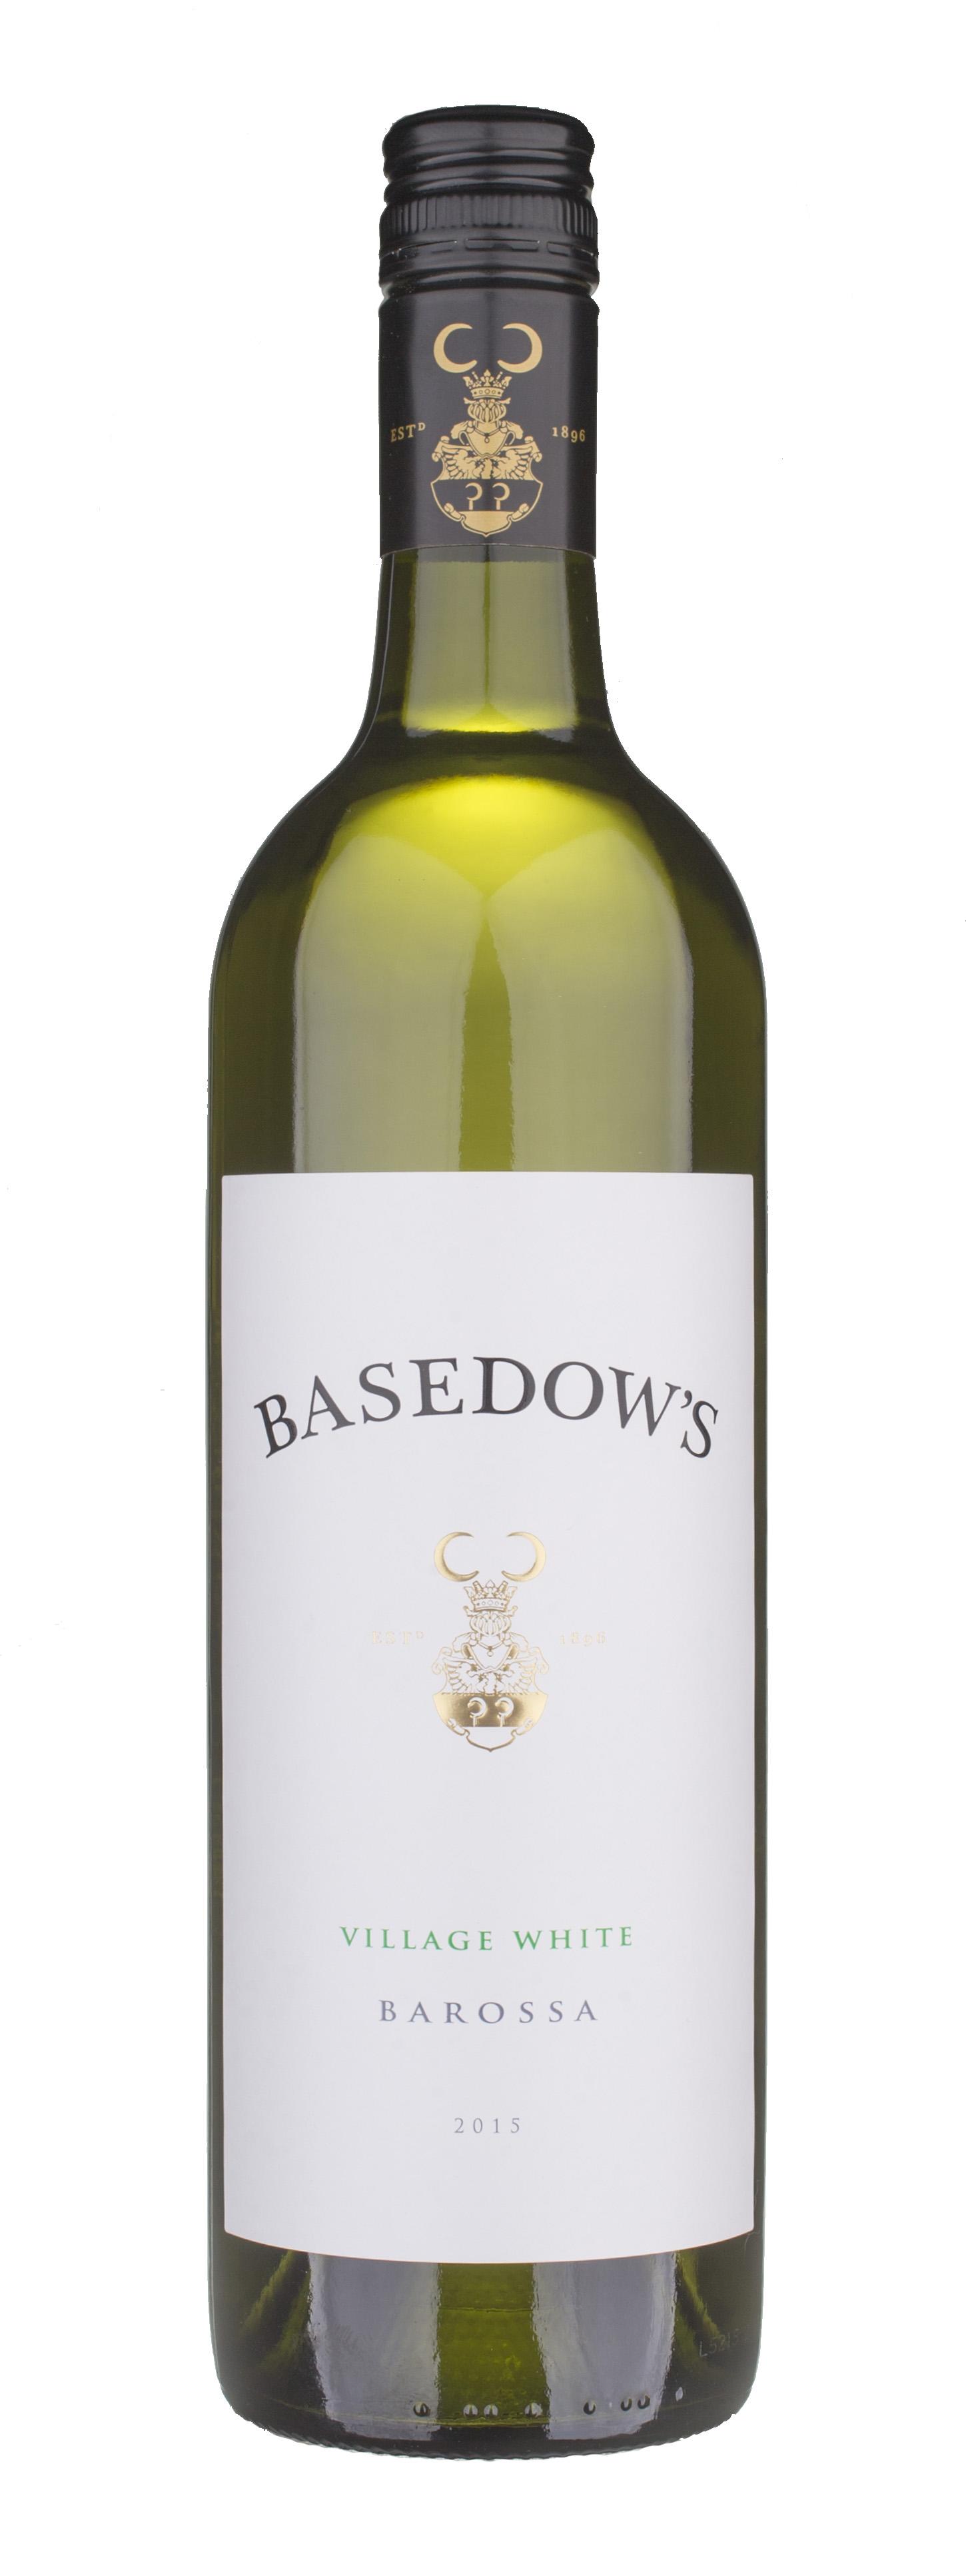 Basedow's Village White 2015 (12 x 750mL) Barossa Valley SA